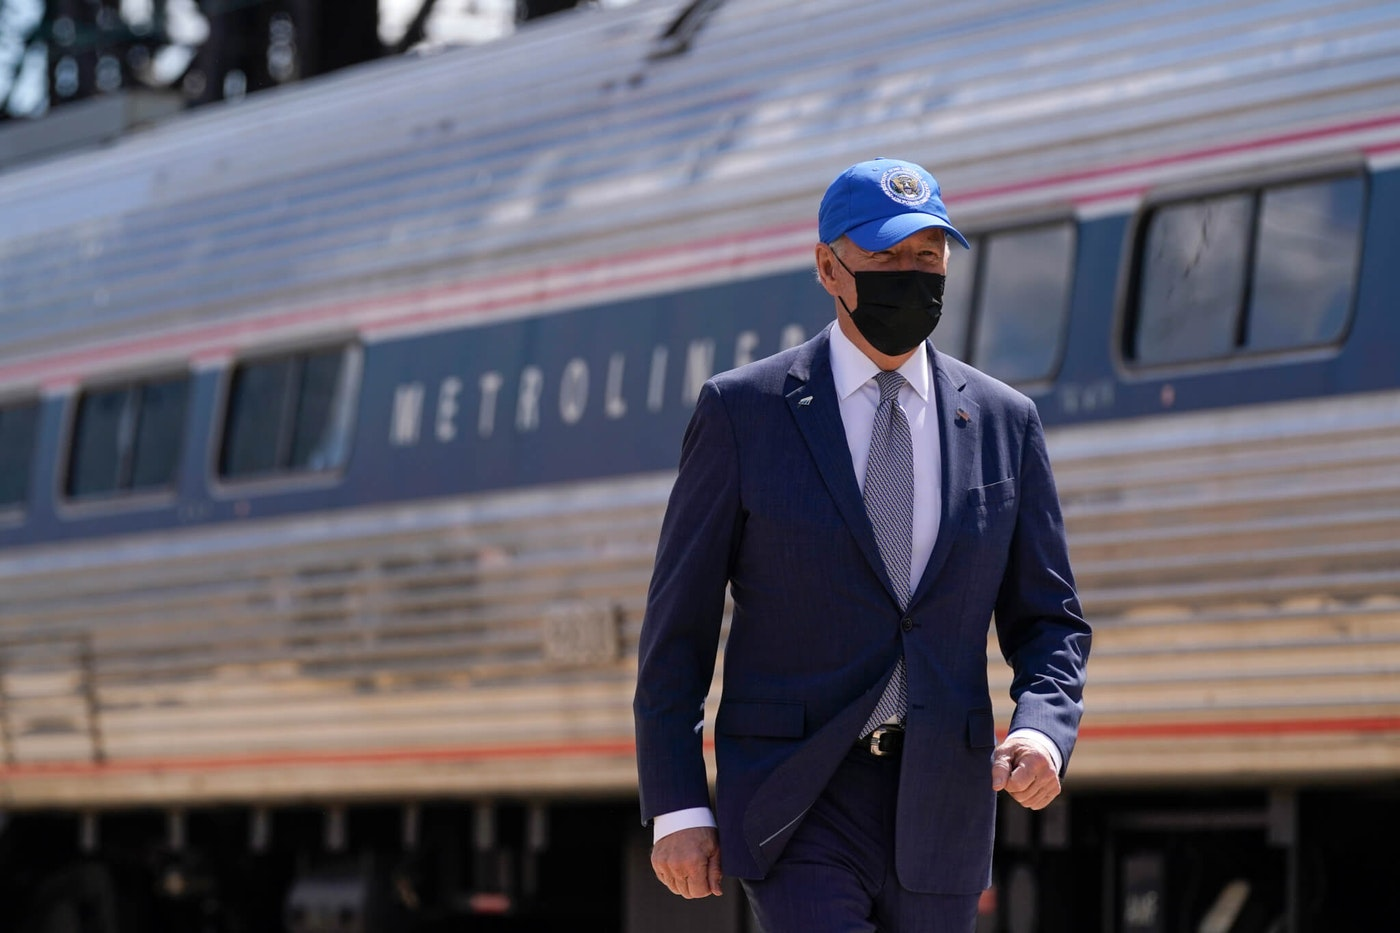 President Joe Biden arrives to speak at an event to mark Amtrak's 50th anniversary at 30th Street Station in Philadelphia, Friday, April 30. (AP Photo/Patrick Semansky)